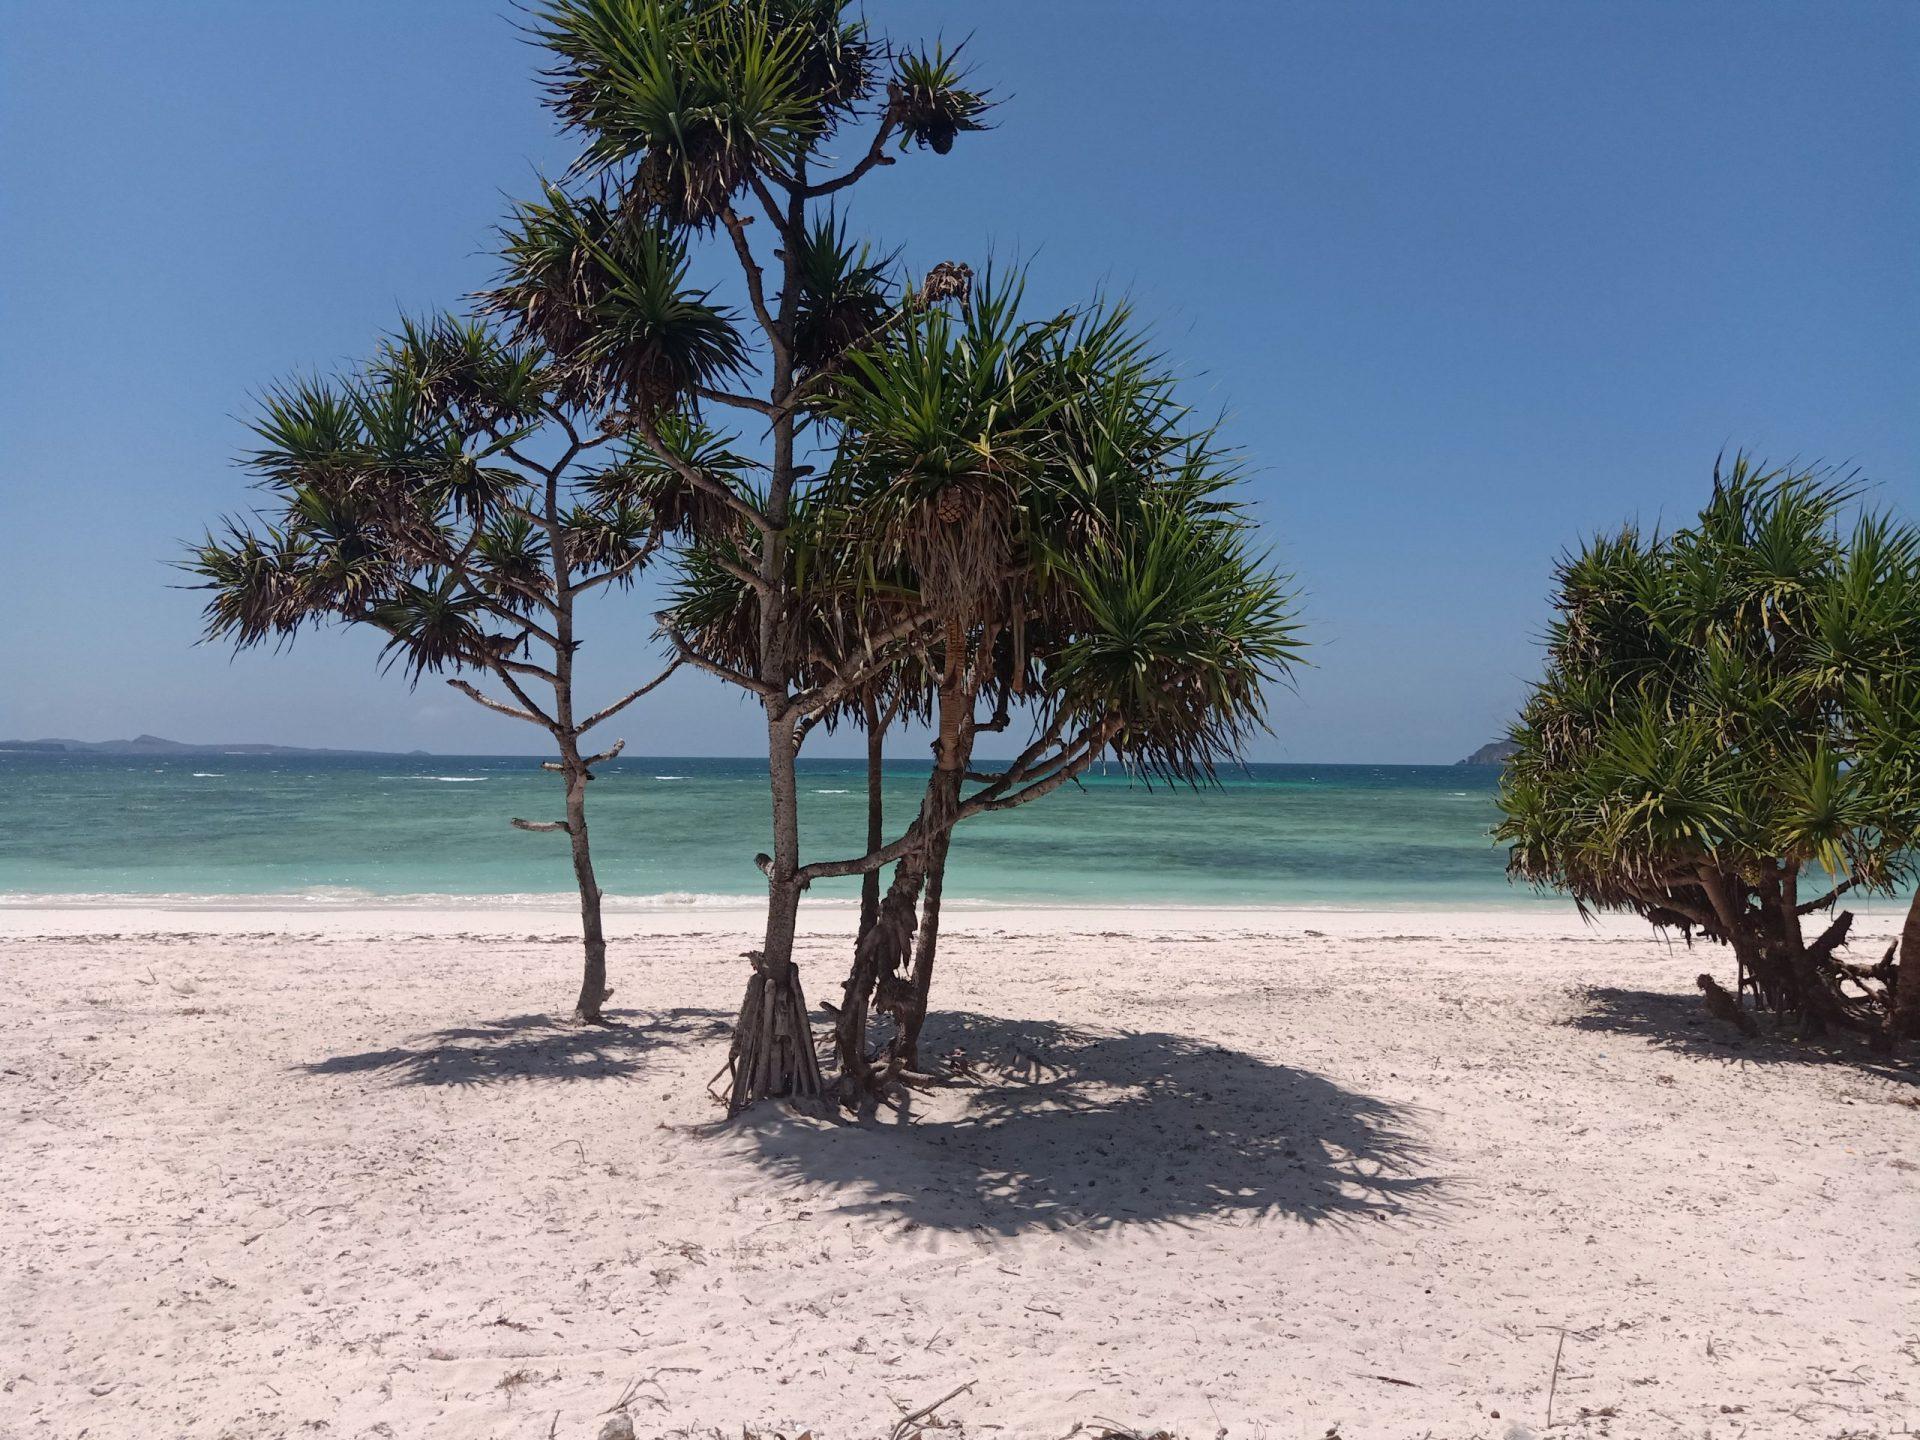 Loedi Bungalows Beach Conservation Project